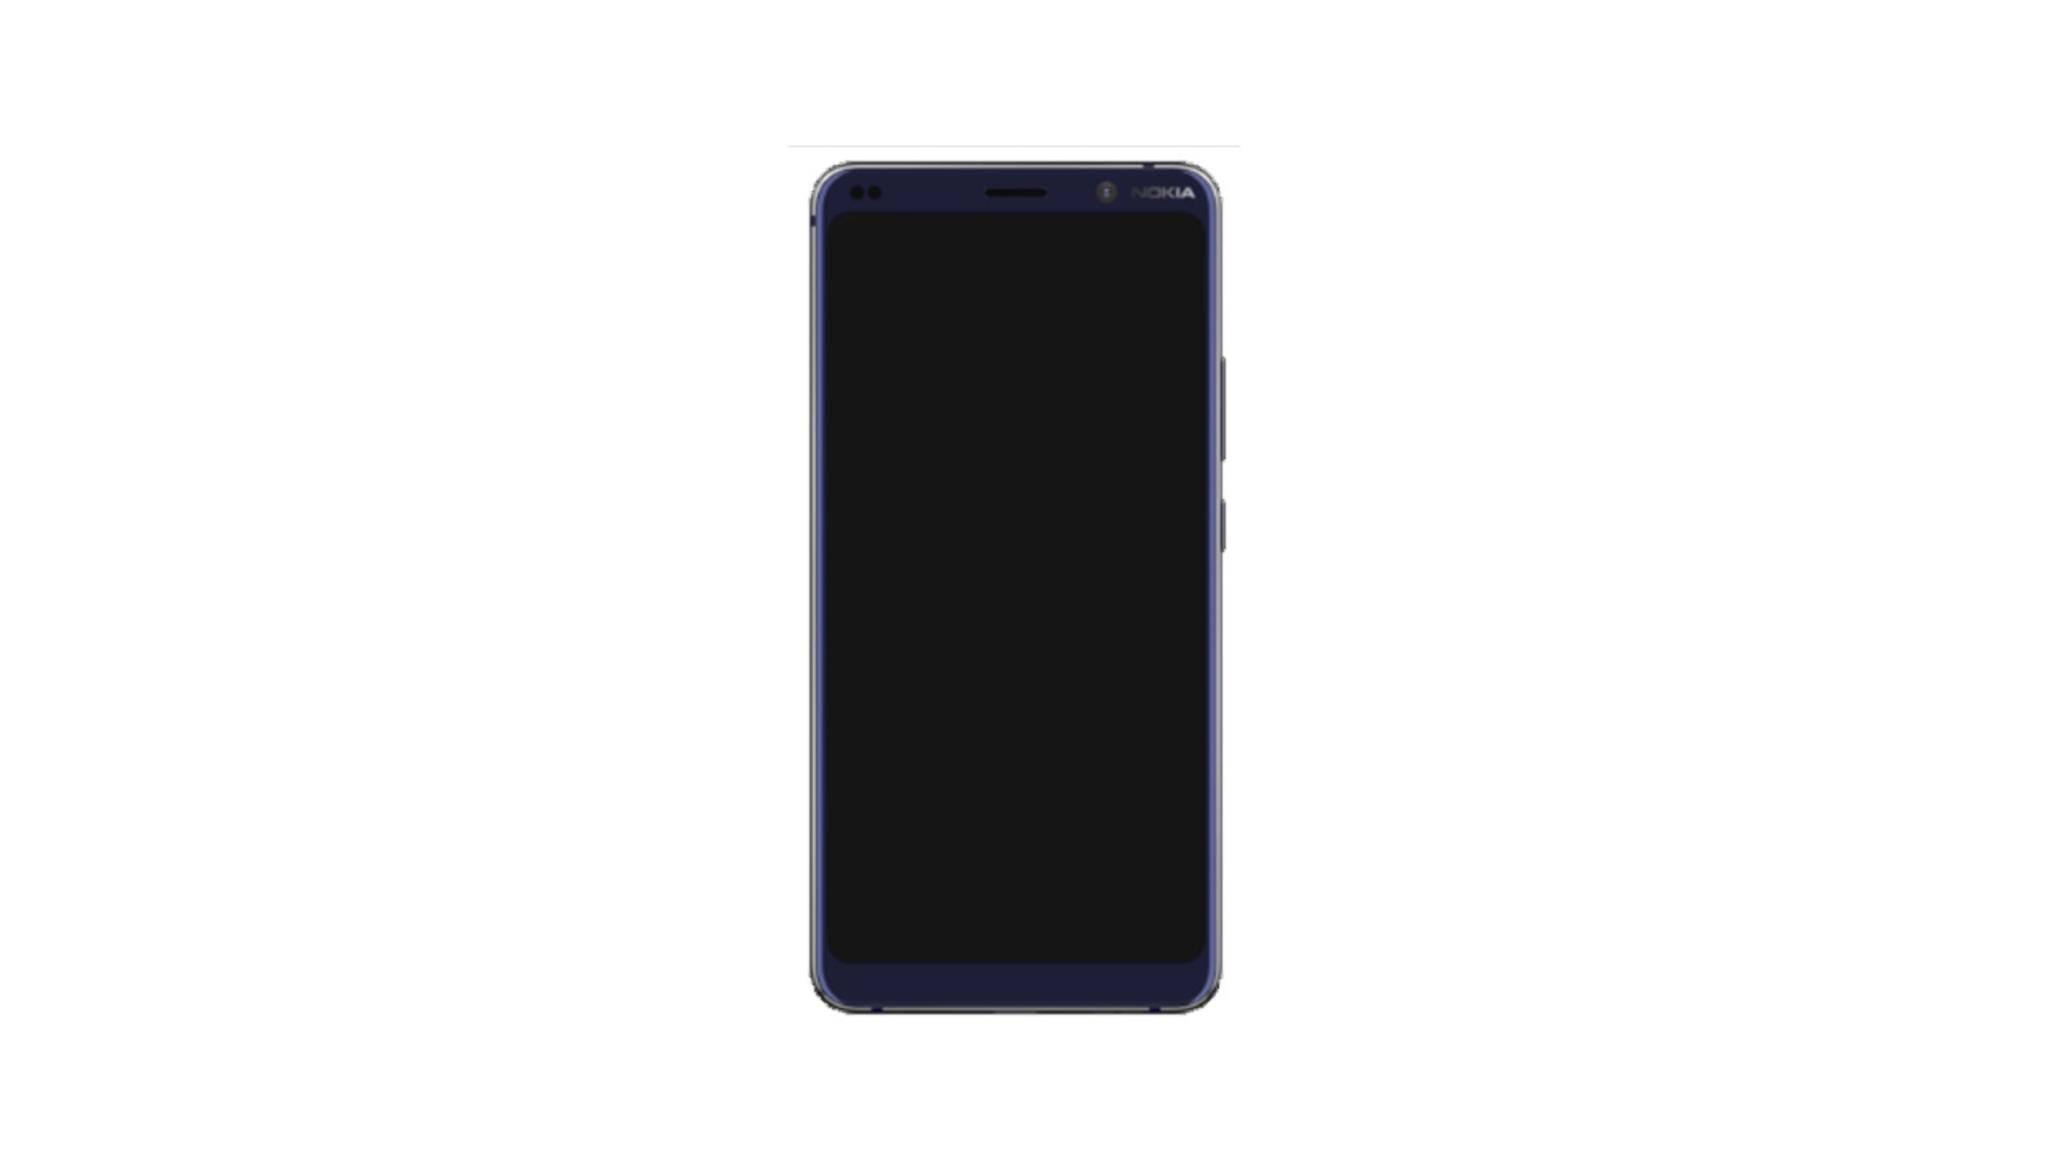 So soll das Nokia 9 PureView aussehen.